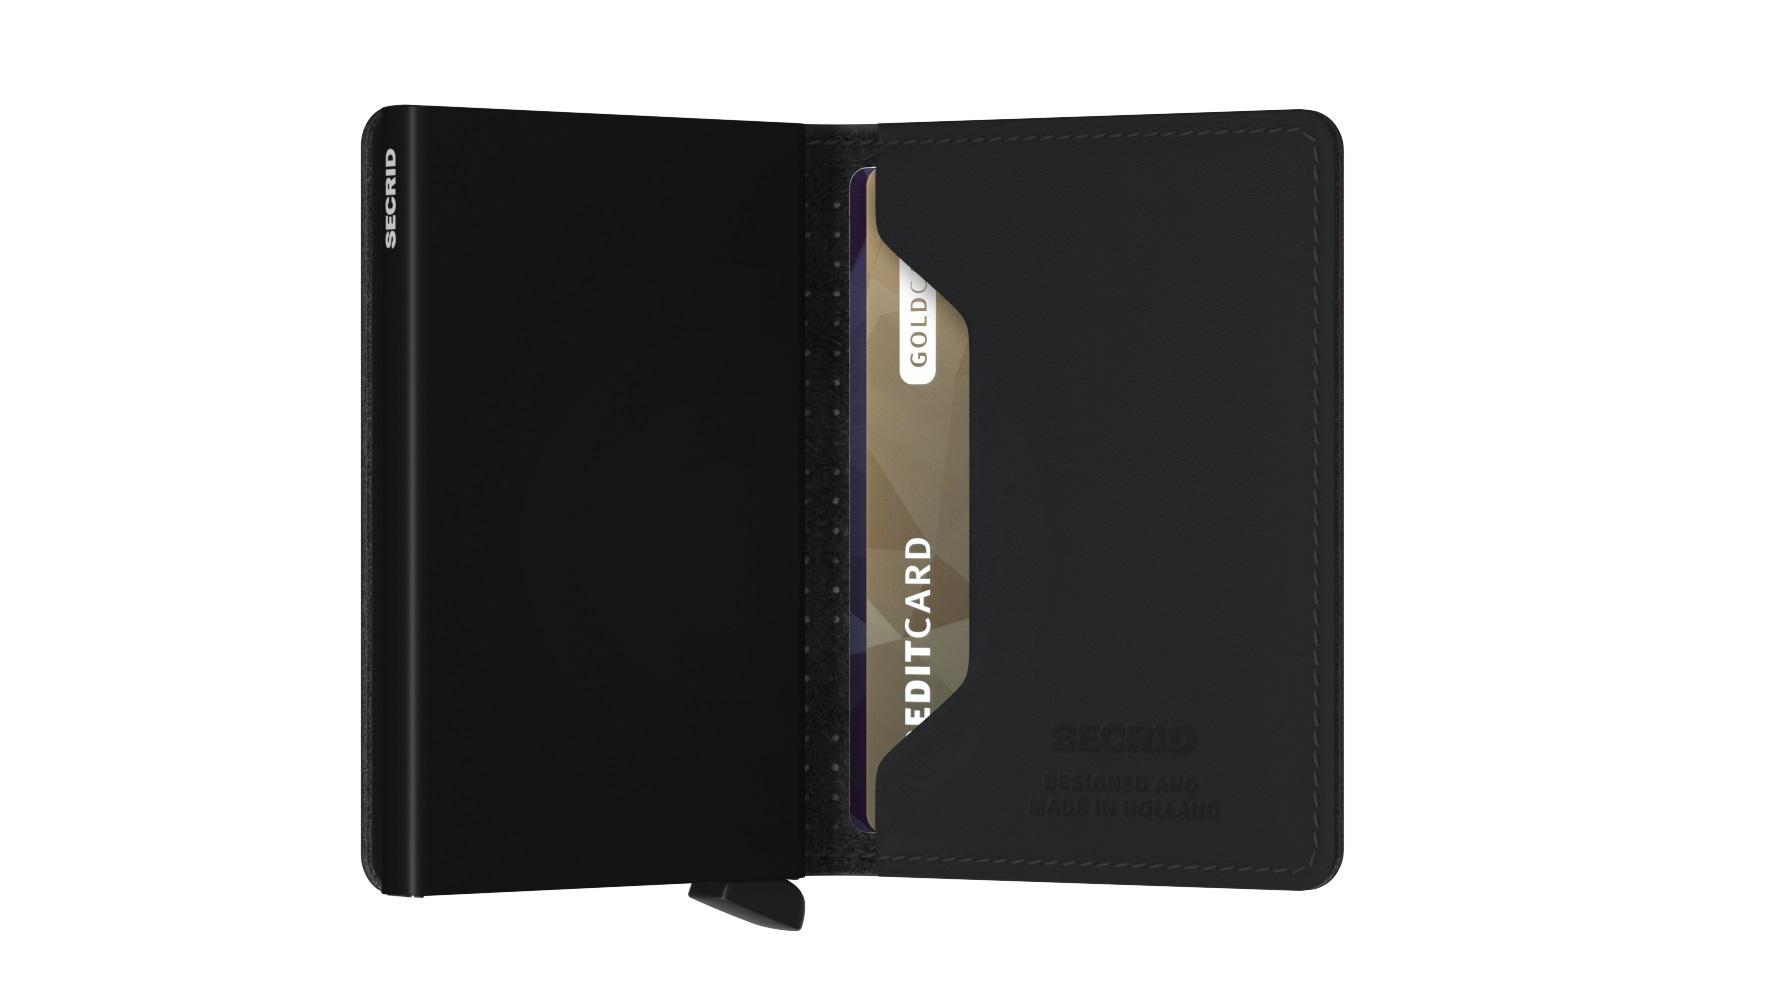 Secrid Portefeuille Secrid Slimwallet Perforated Black